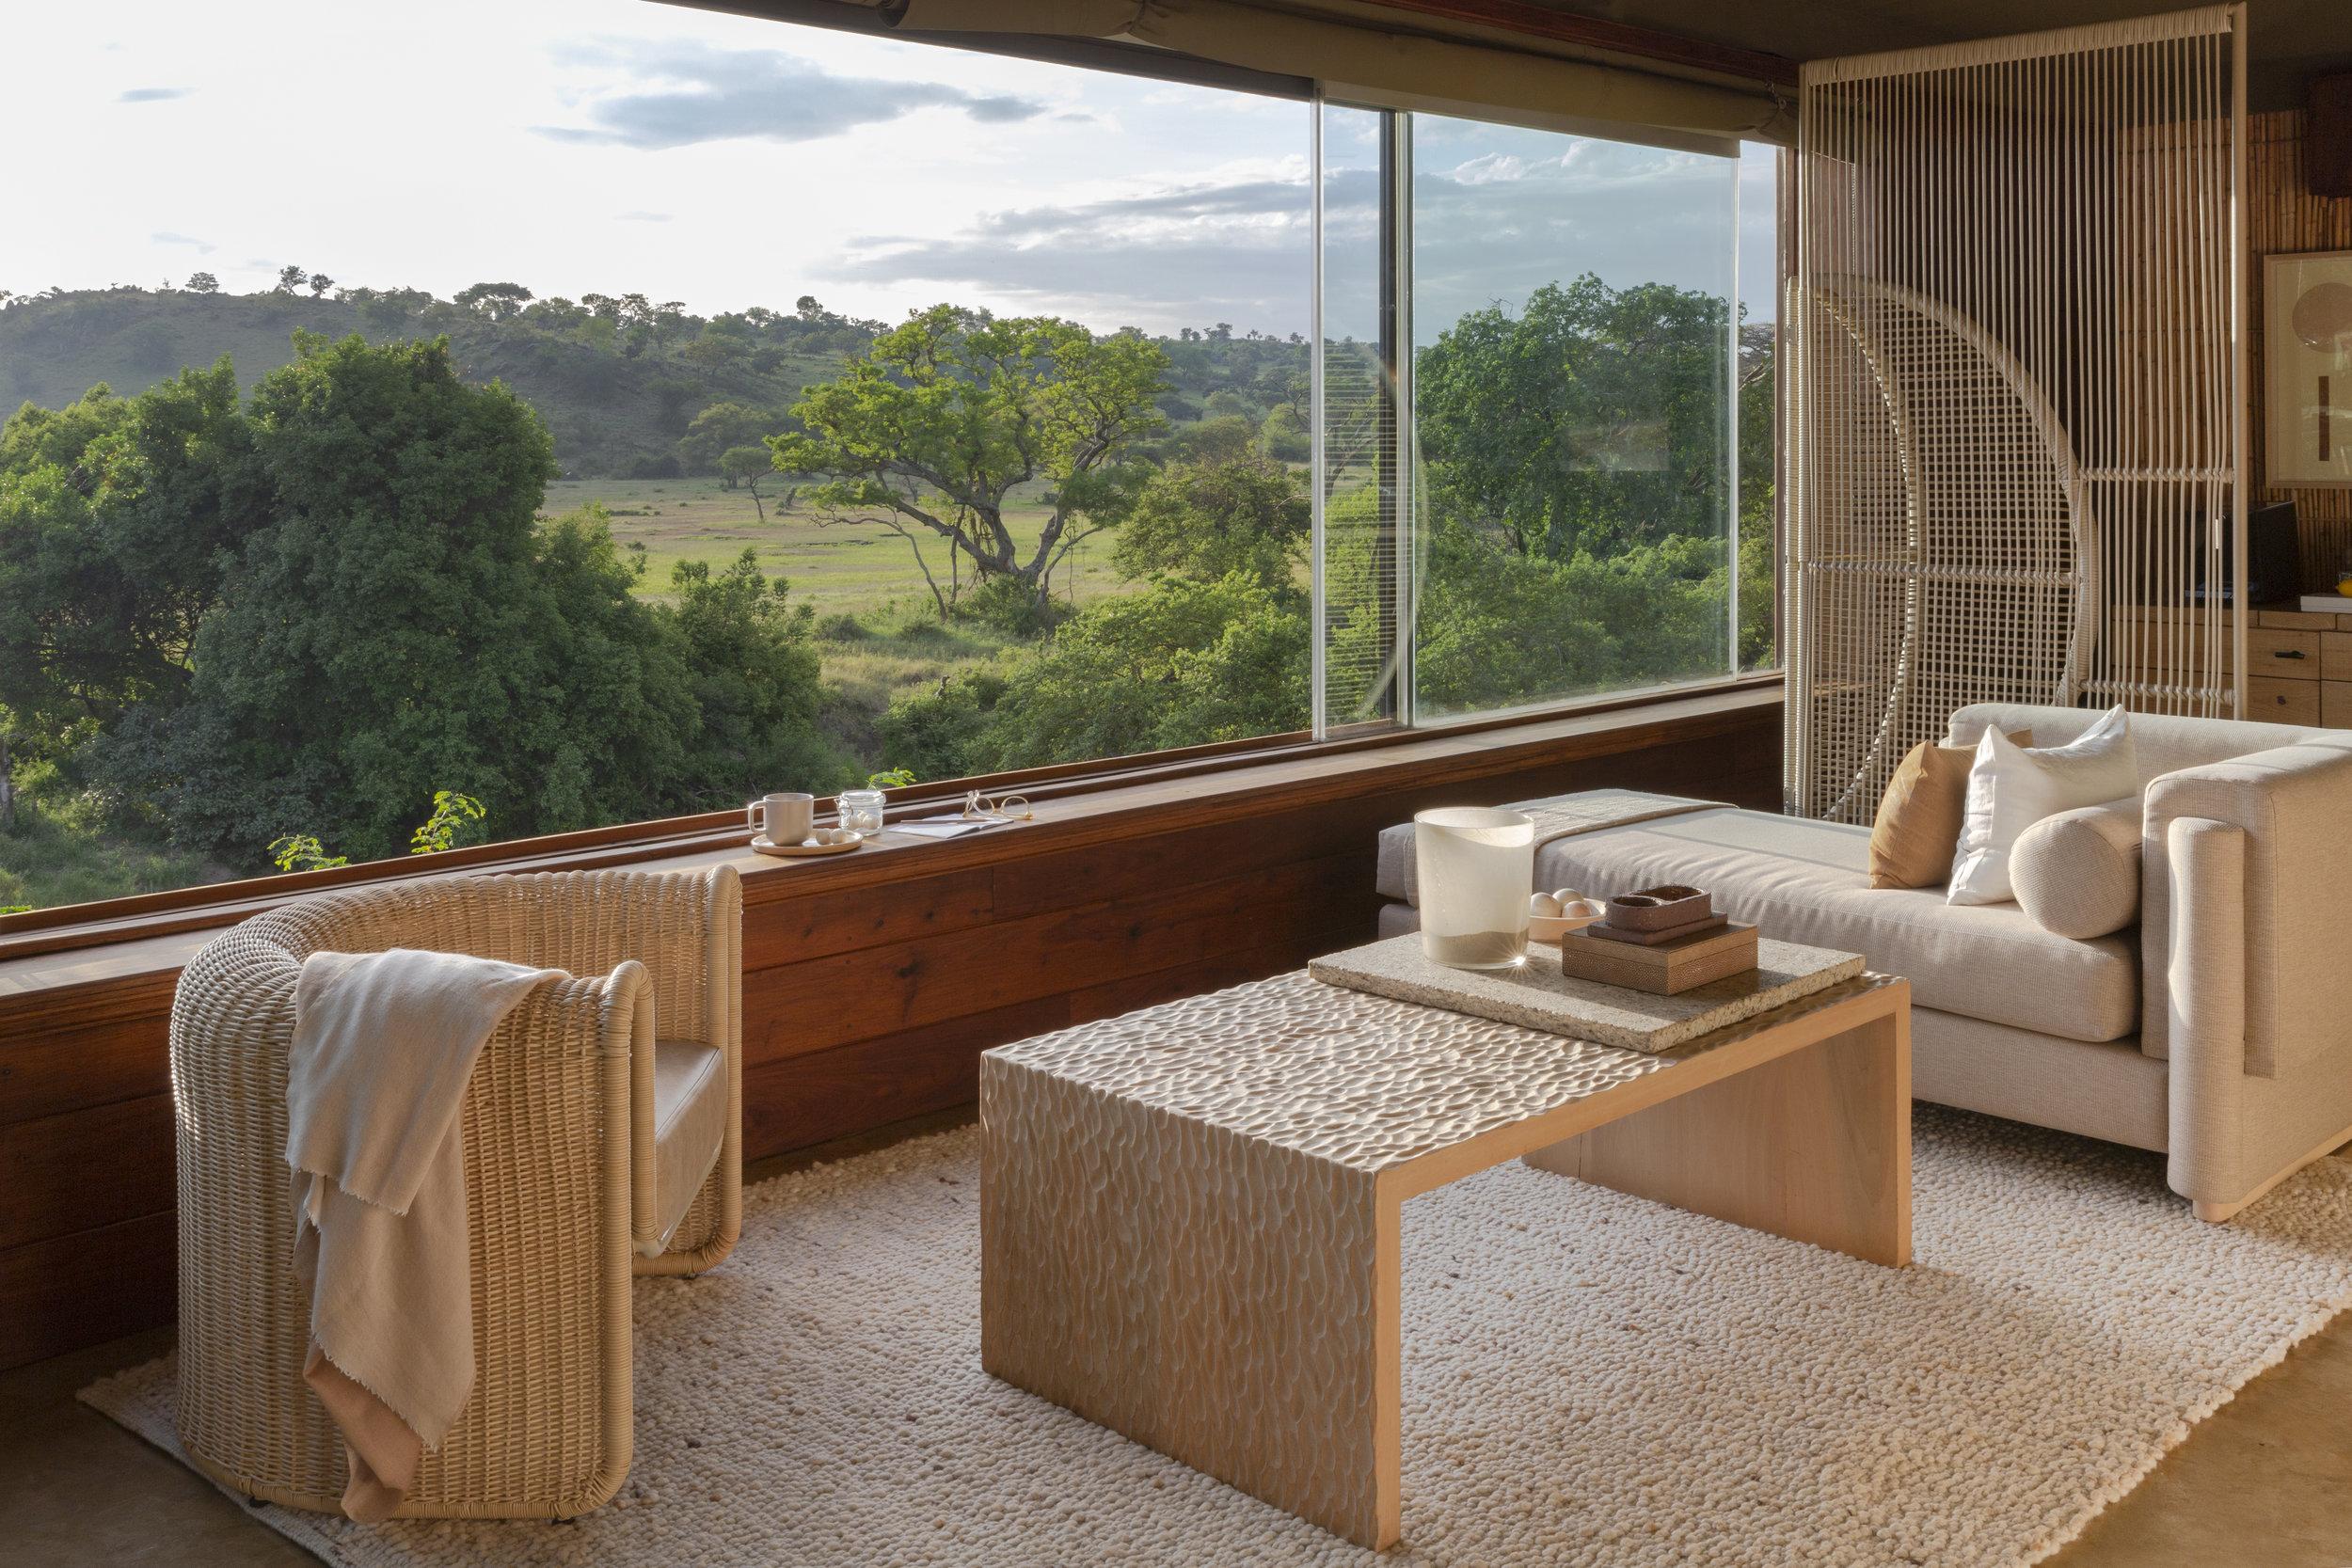 singita-faru-faru-lodge-suite_lounge_with_a_view.jpg